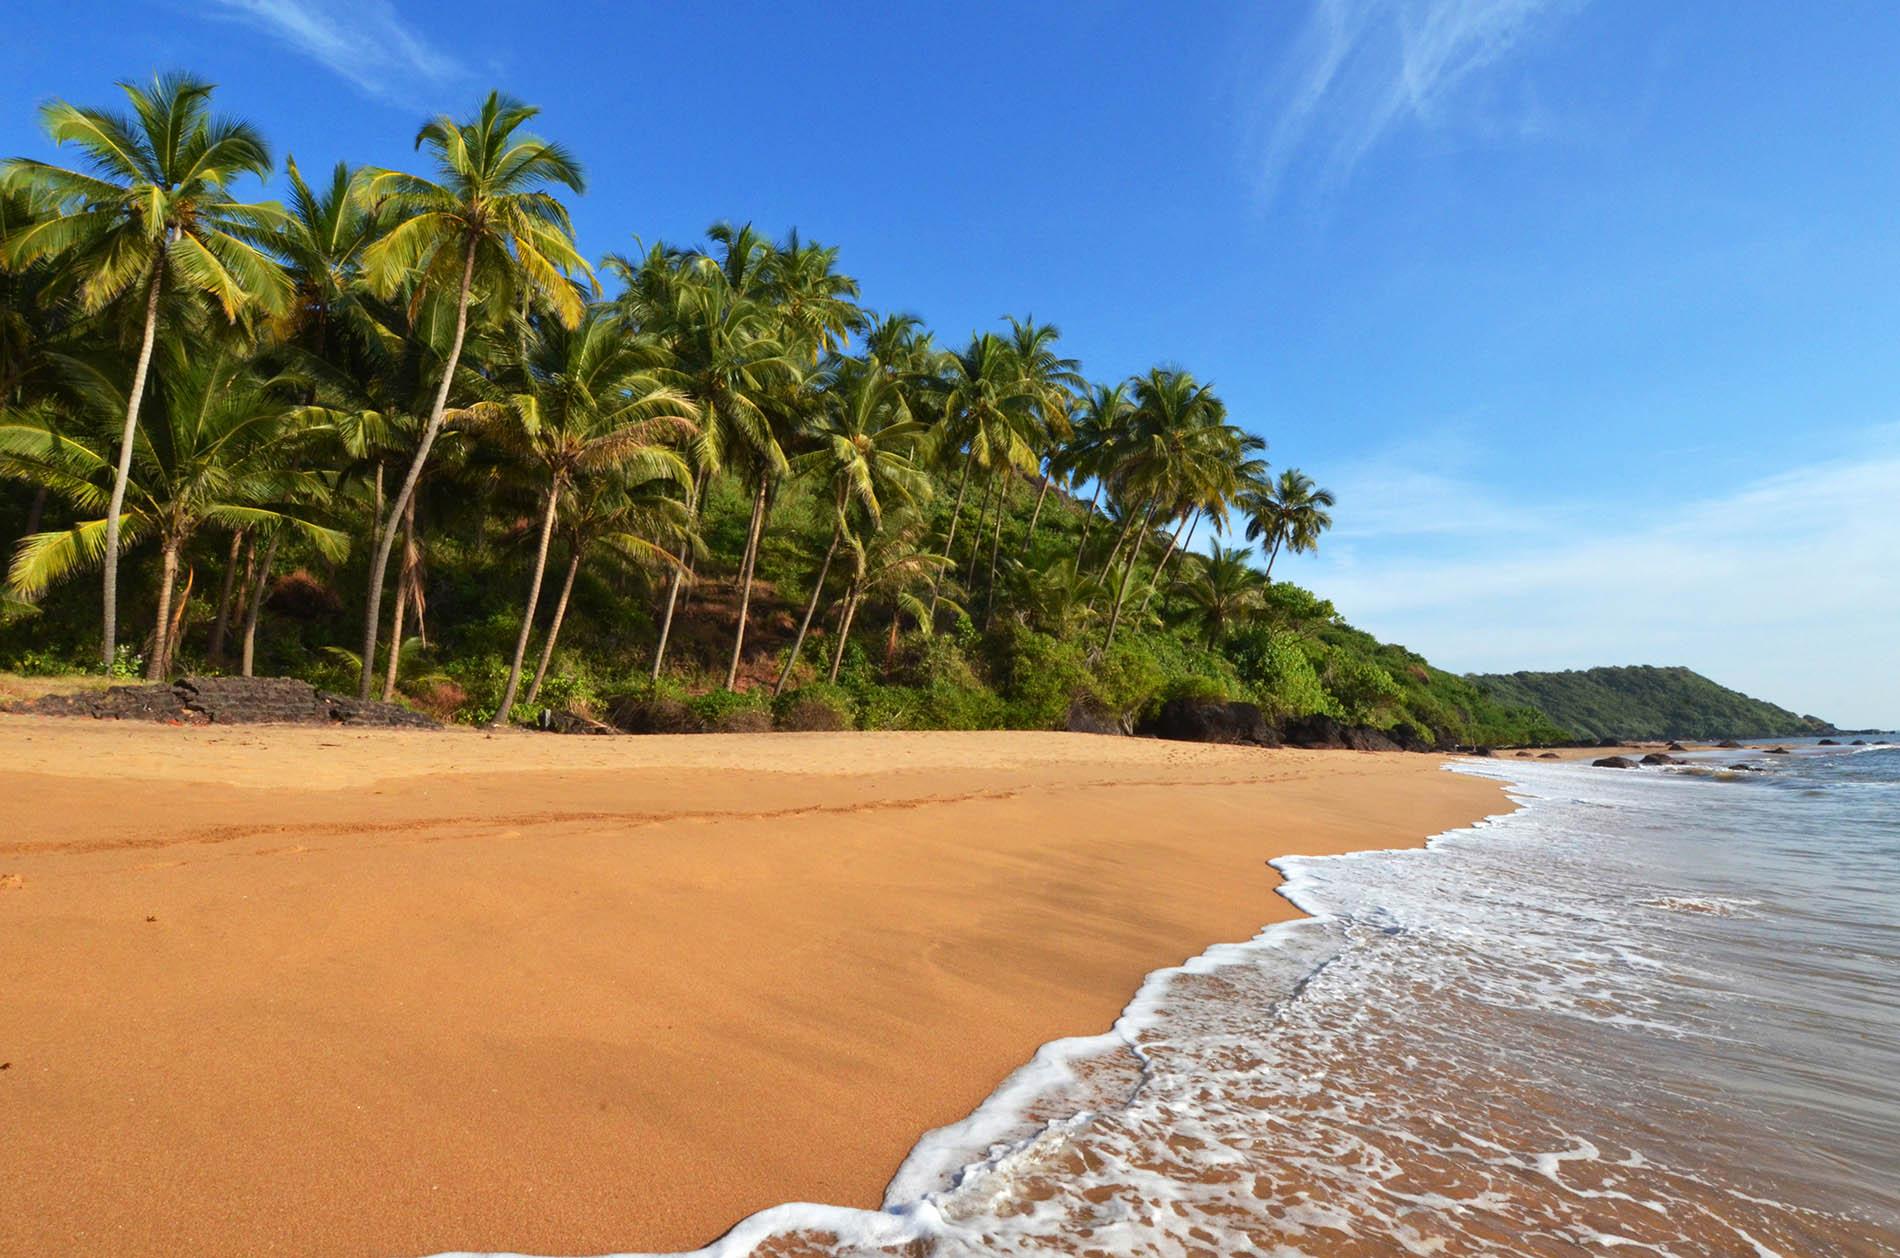 North Goa Beach India